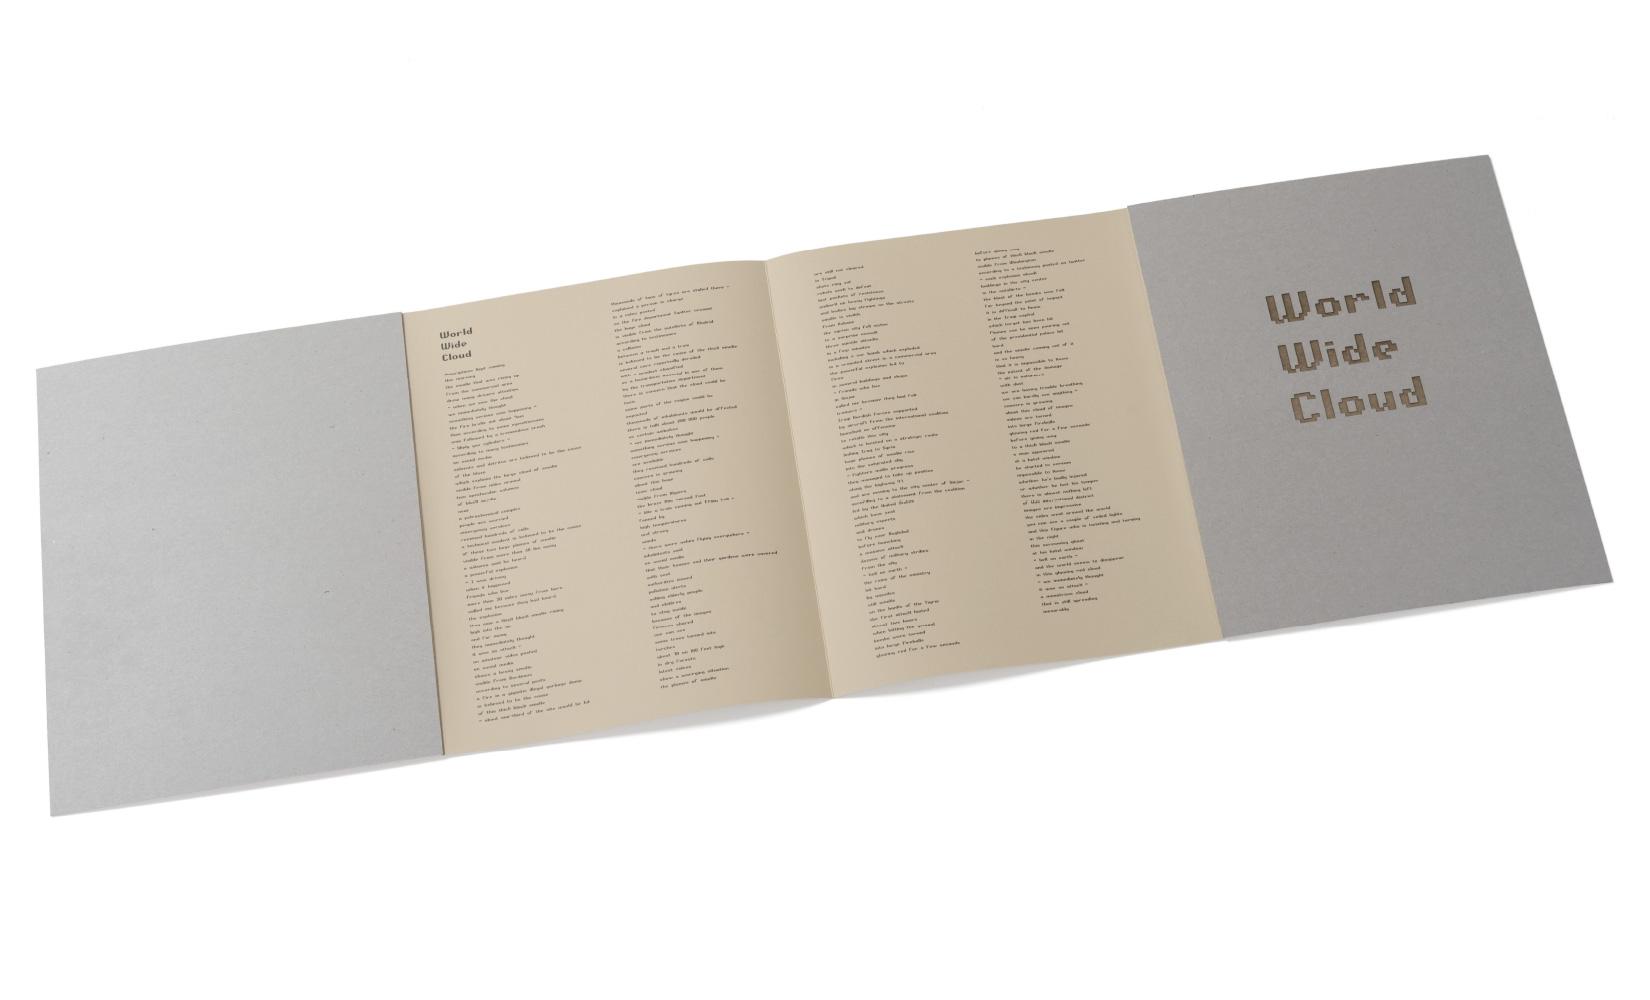 THOMAS-RUFF-TOLUCA-EDITIONS-OLIVIER-ANDREOTTI-05.jpg